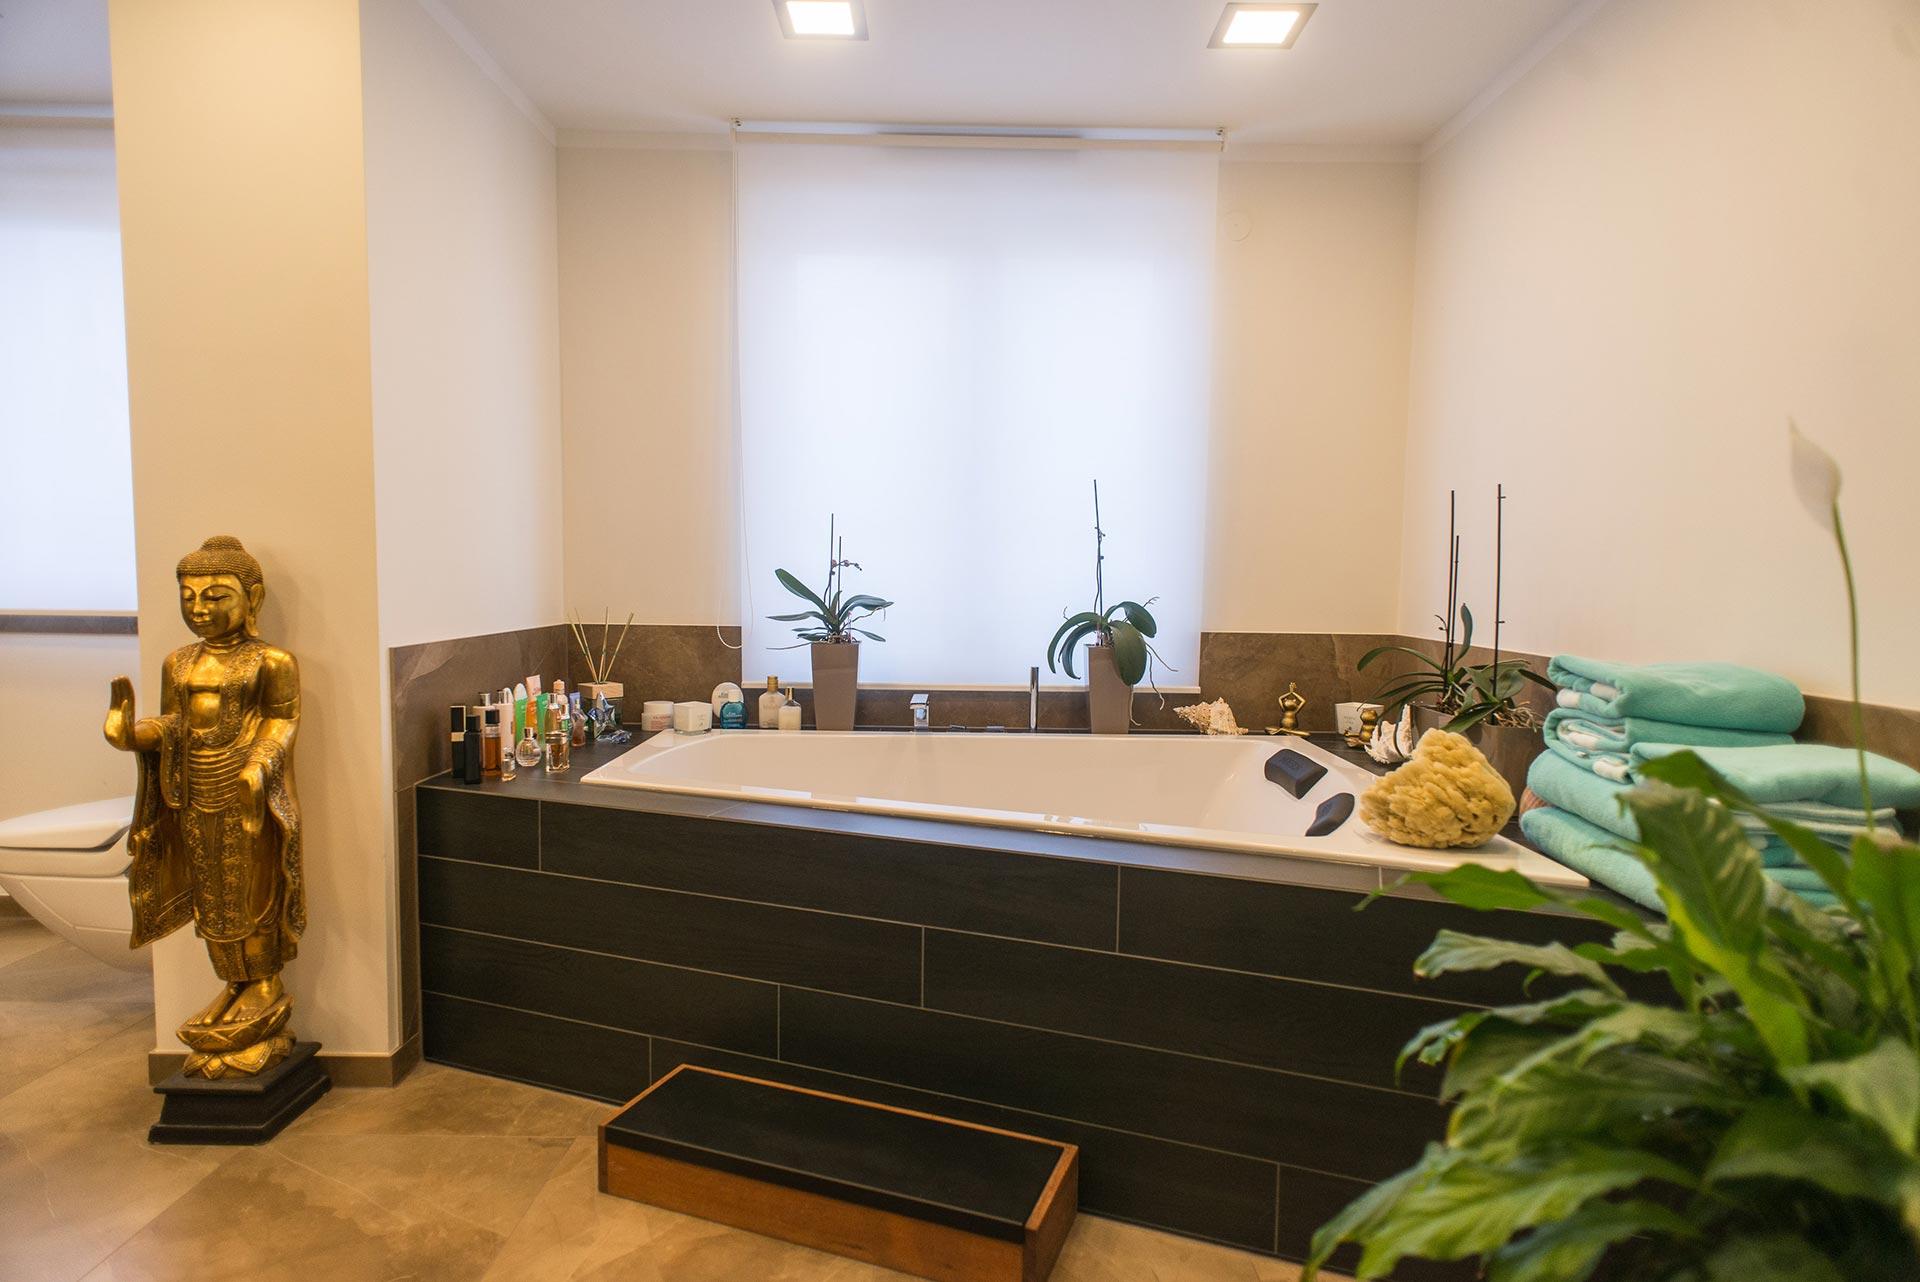 https://wetzl-innenausbau.de/wp-content/uploads/2017/10/innenausbau-wetzl-muenchen-badezimmer-komplettumbau-08.jpg